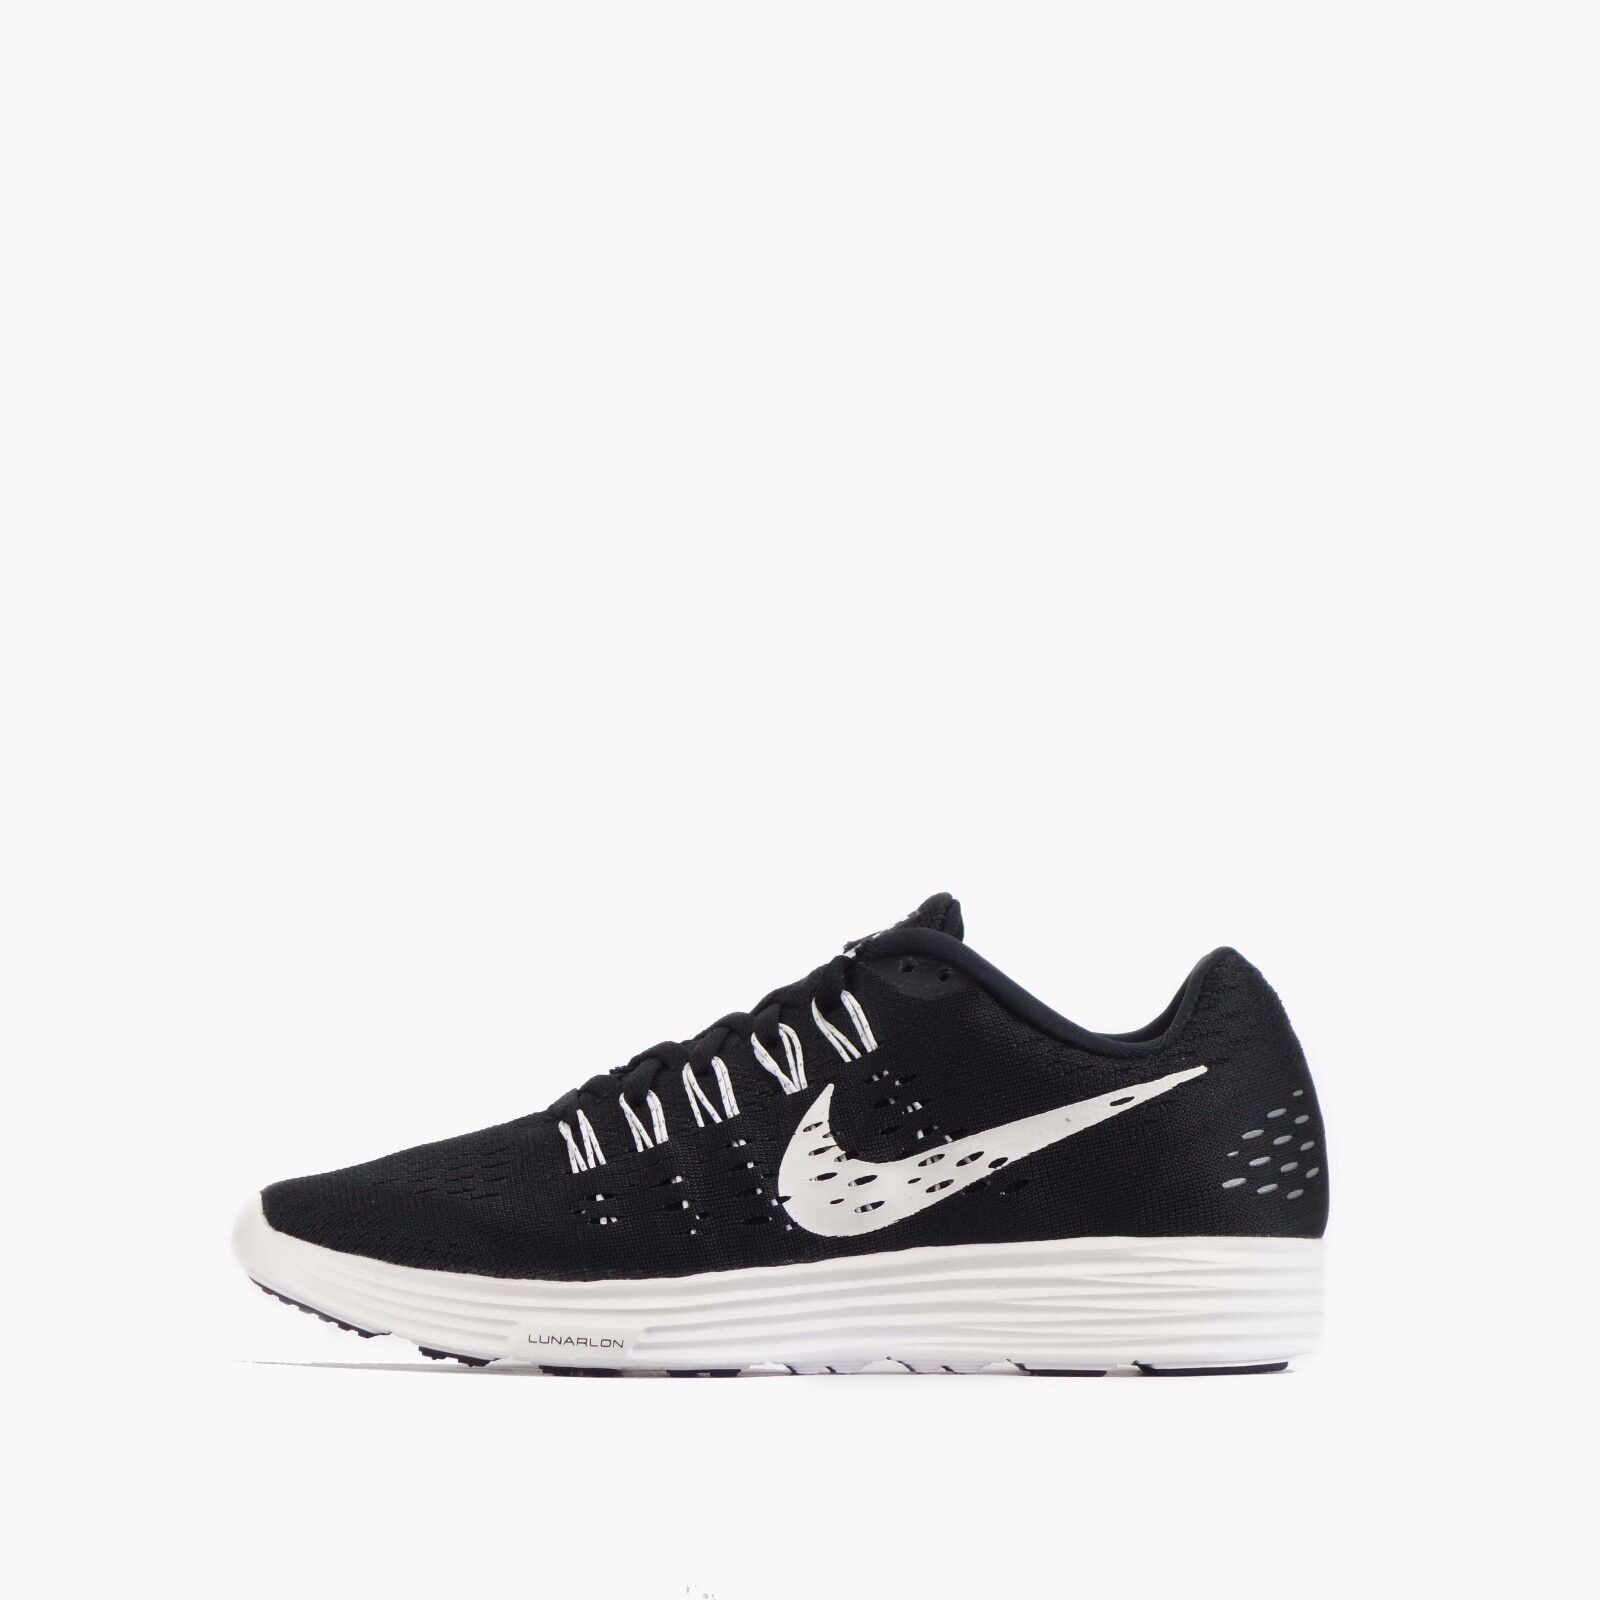 Nike Lunartempo Women's Lightweight Running Shoes Black/White